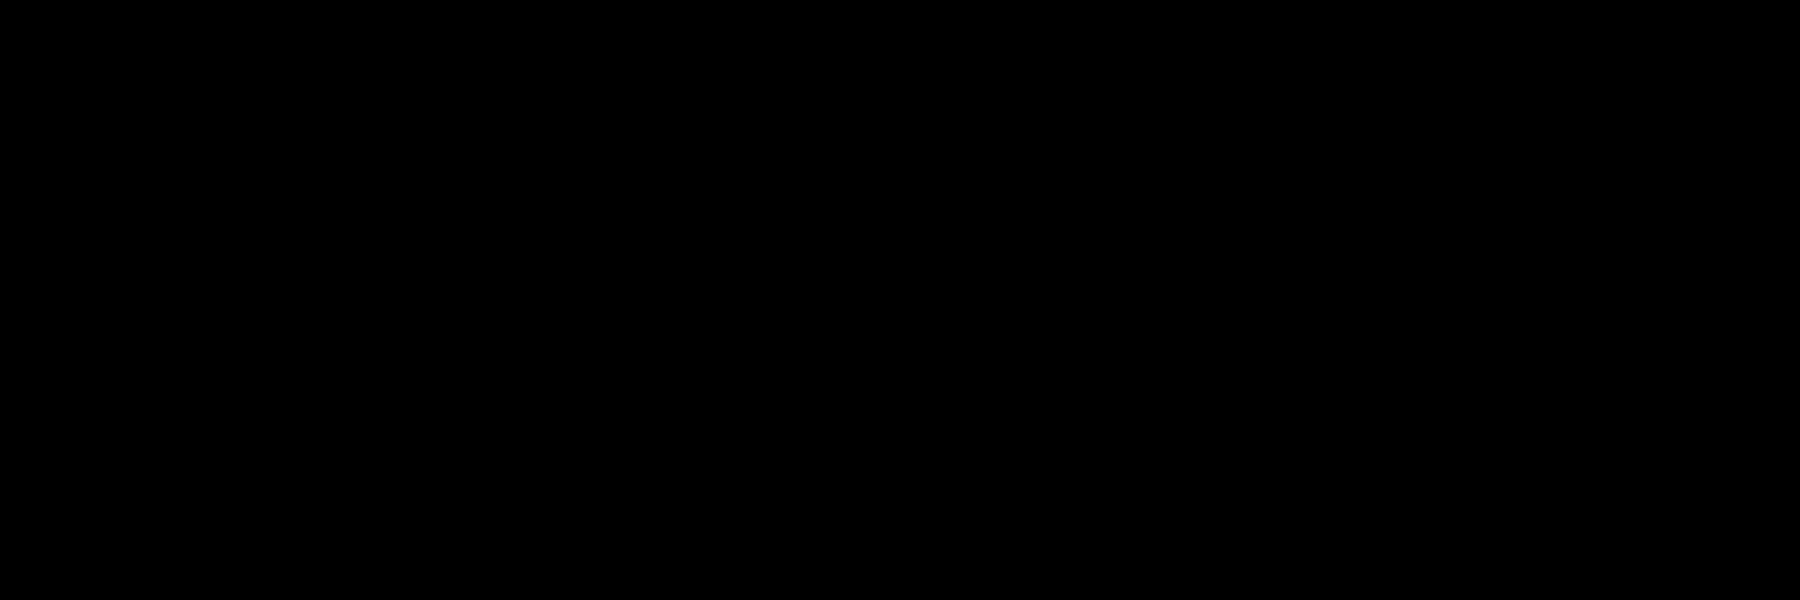 FFG_Logo_DE_black_1000px